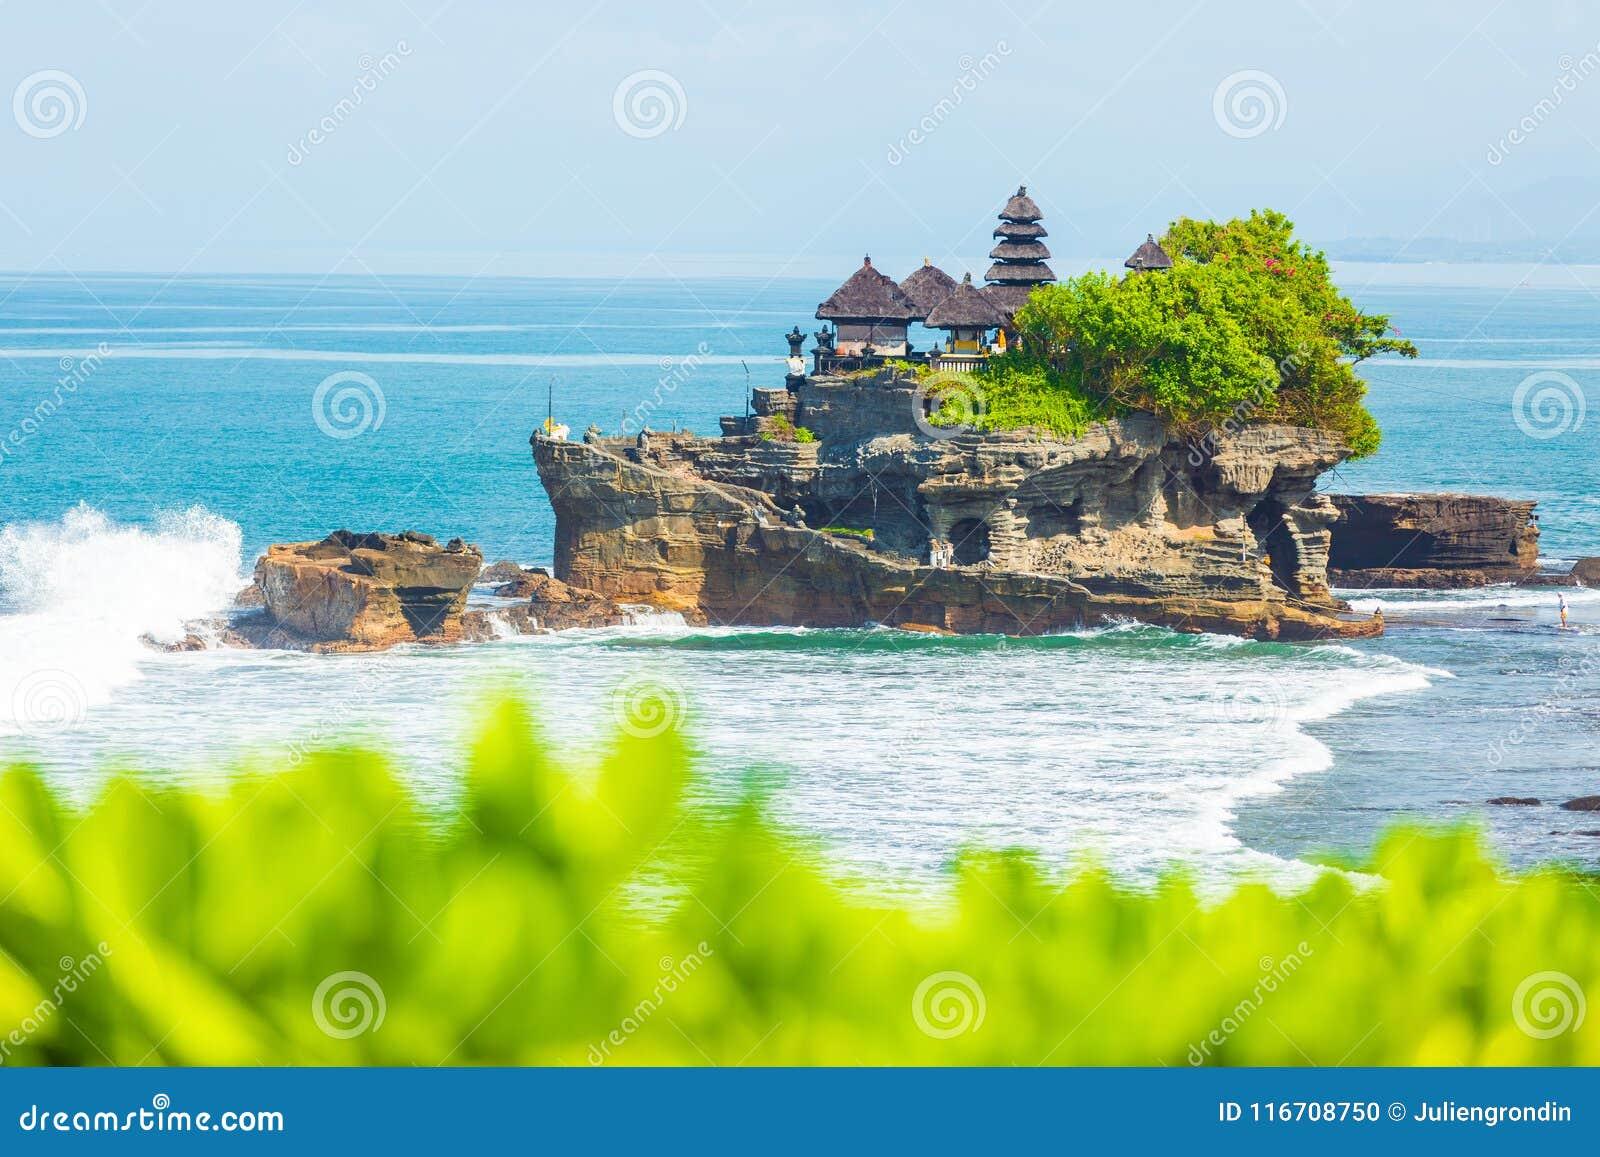 Mycket tanah bali indonesia